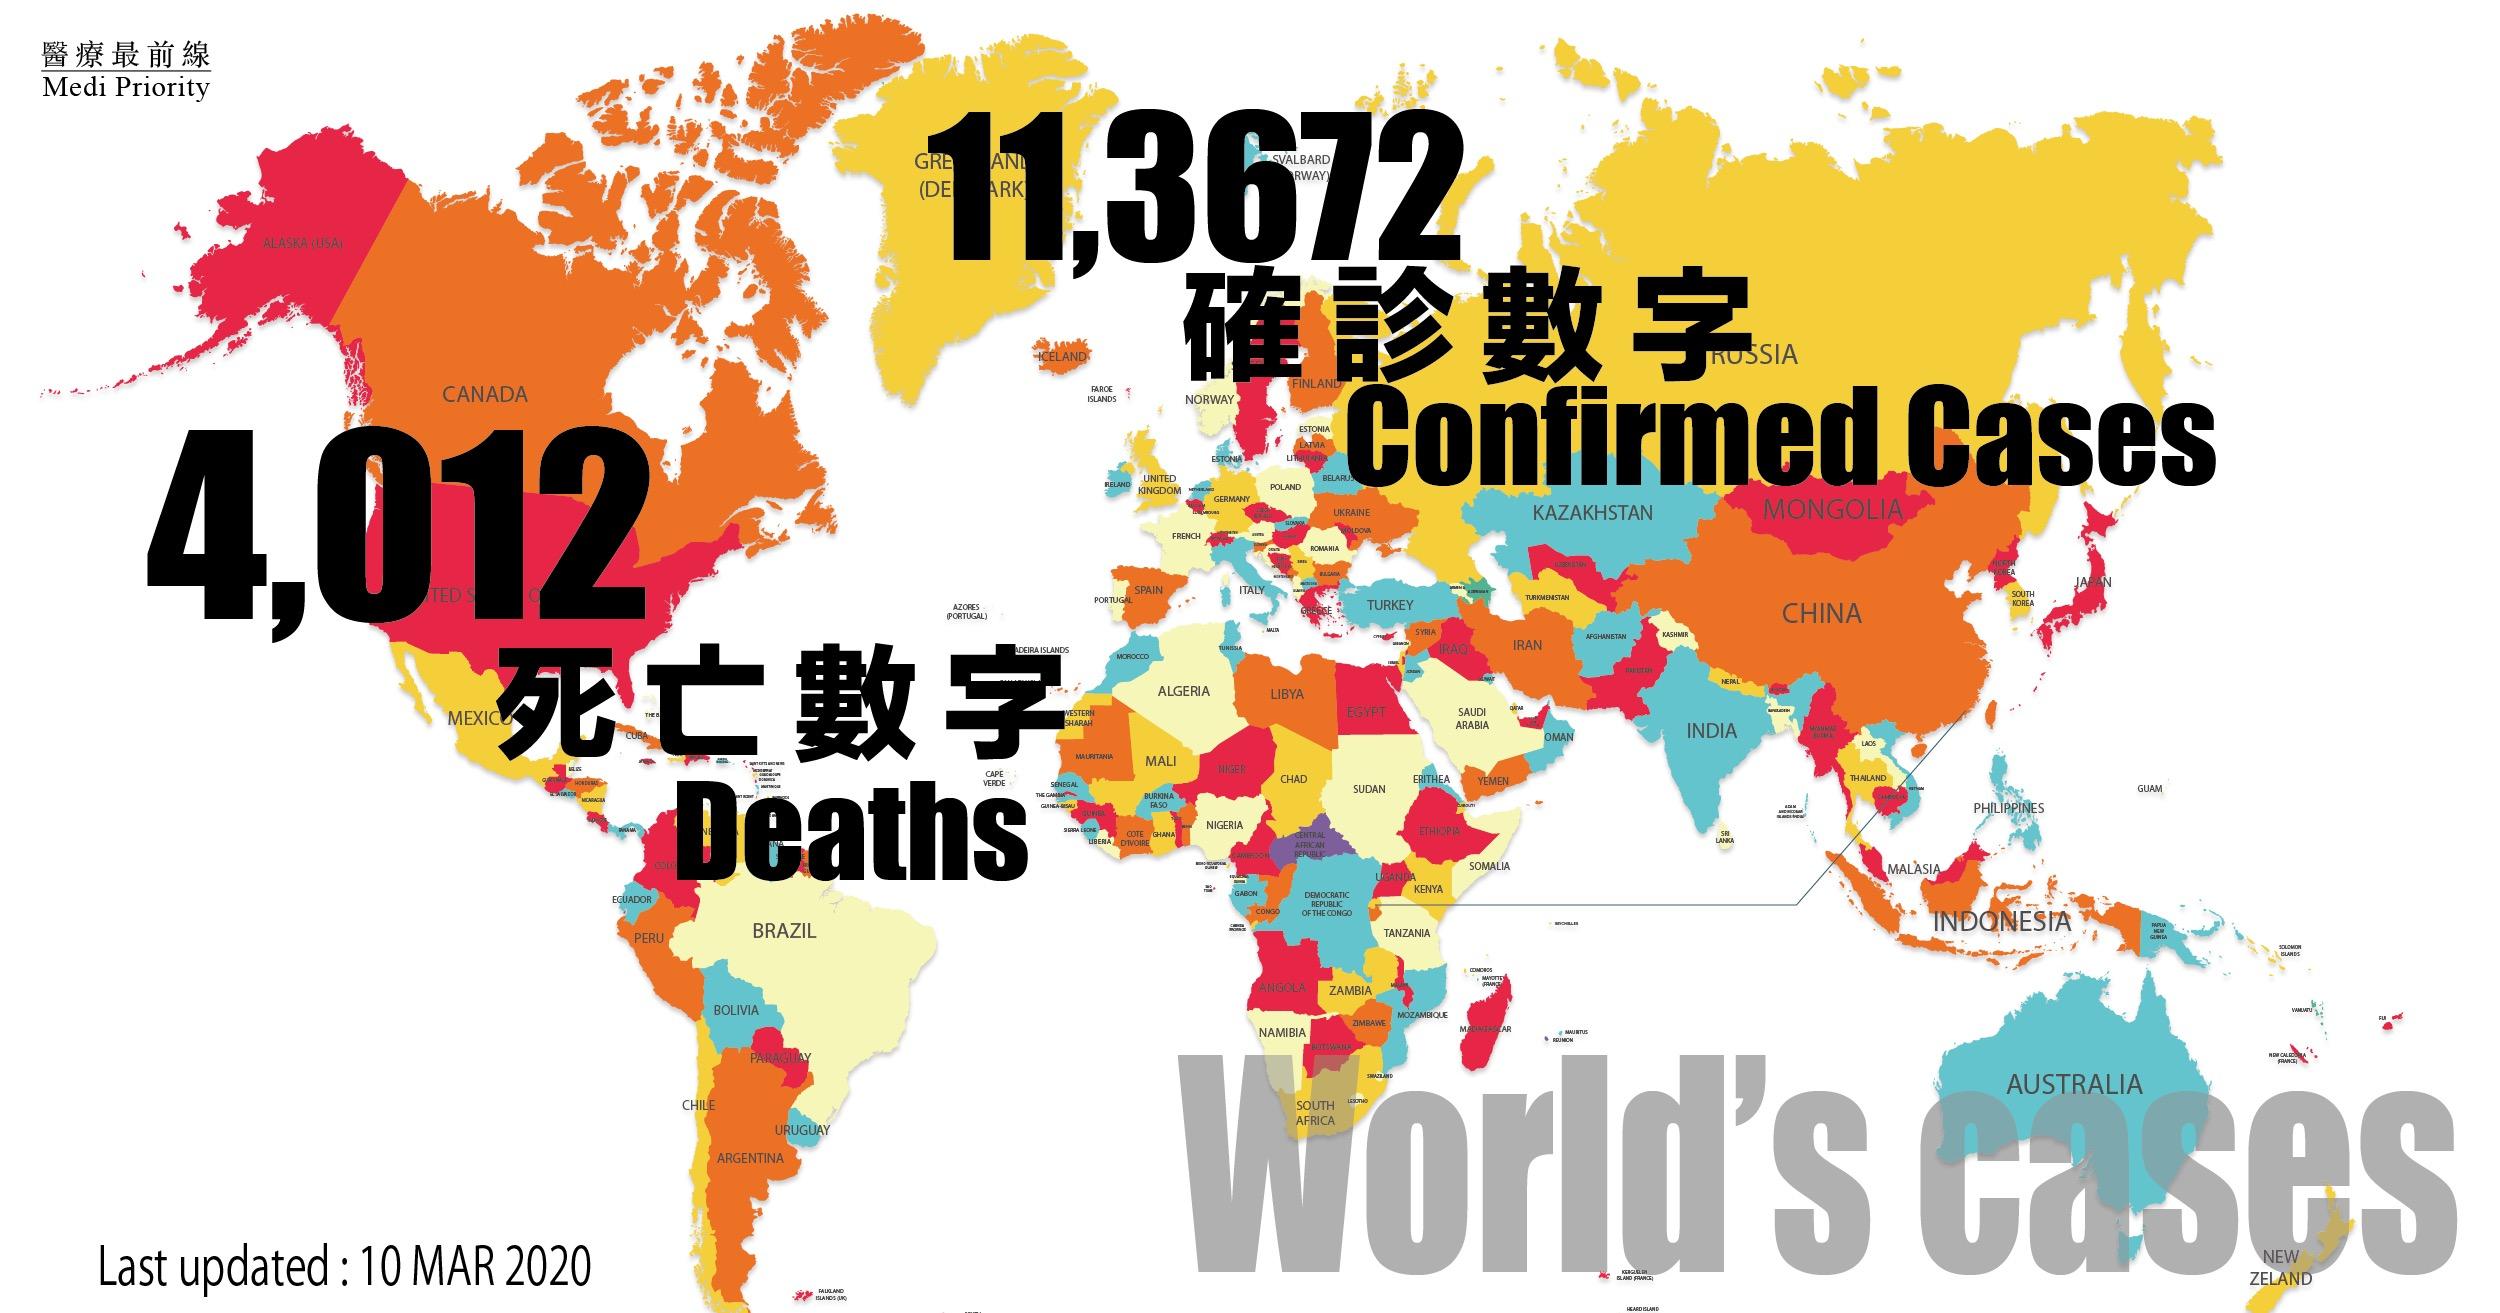 【Covid 19 確診及死亡病例】 Global Cases and Deaths 20200310